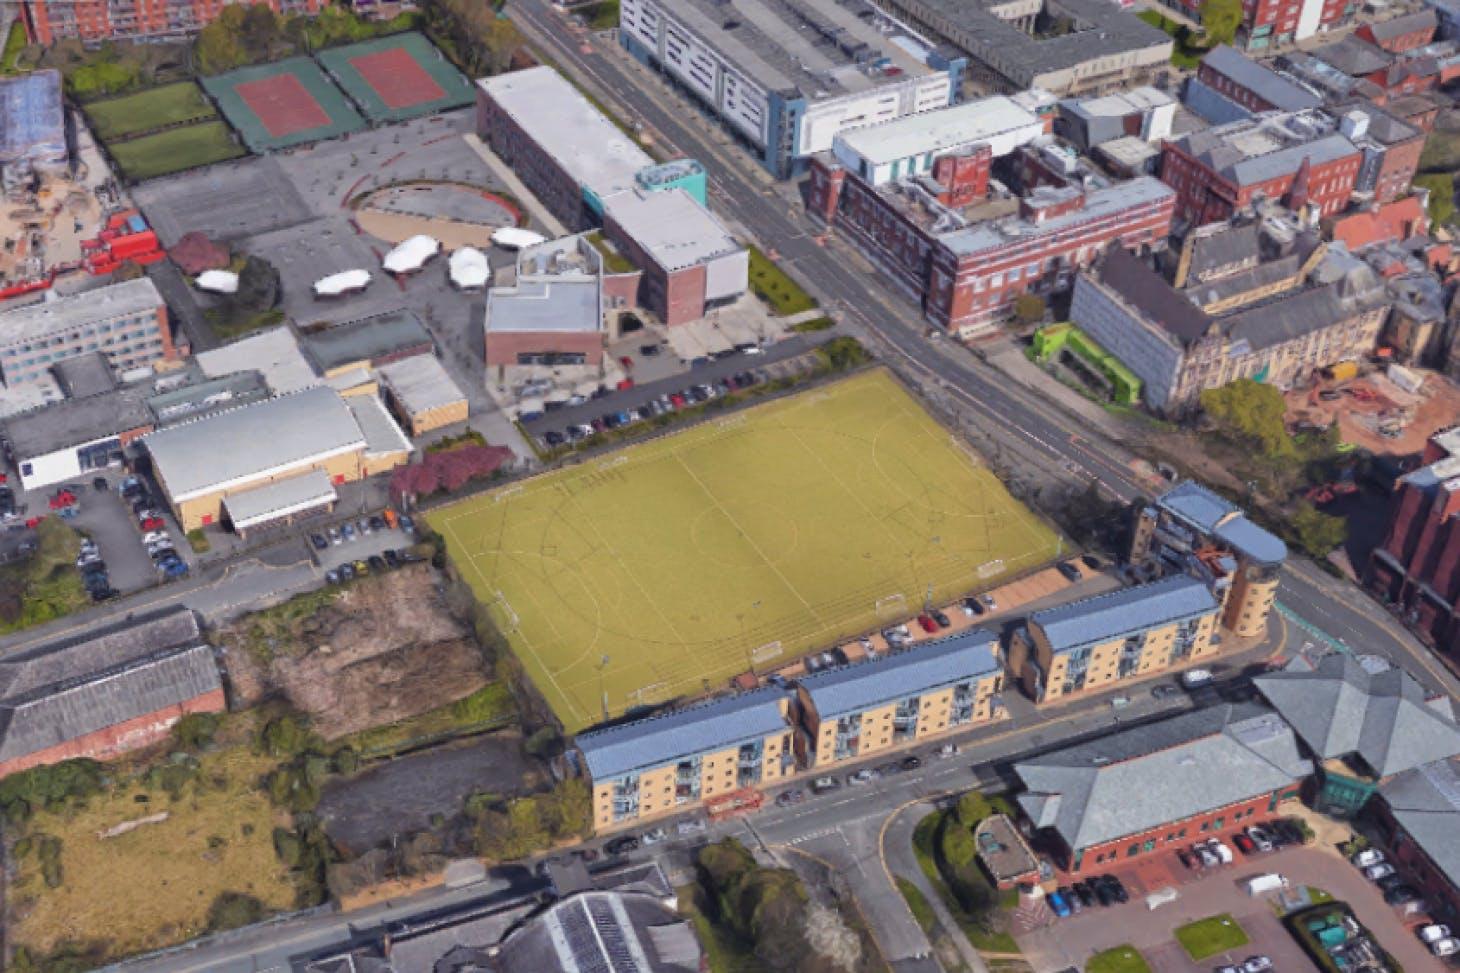 Trinity Sports Centre 7 a side   Astroturf football pitch